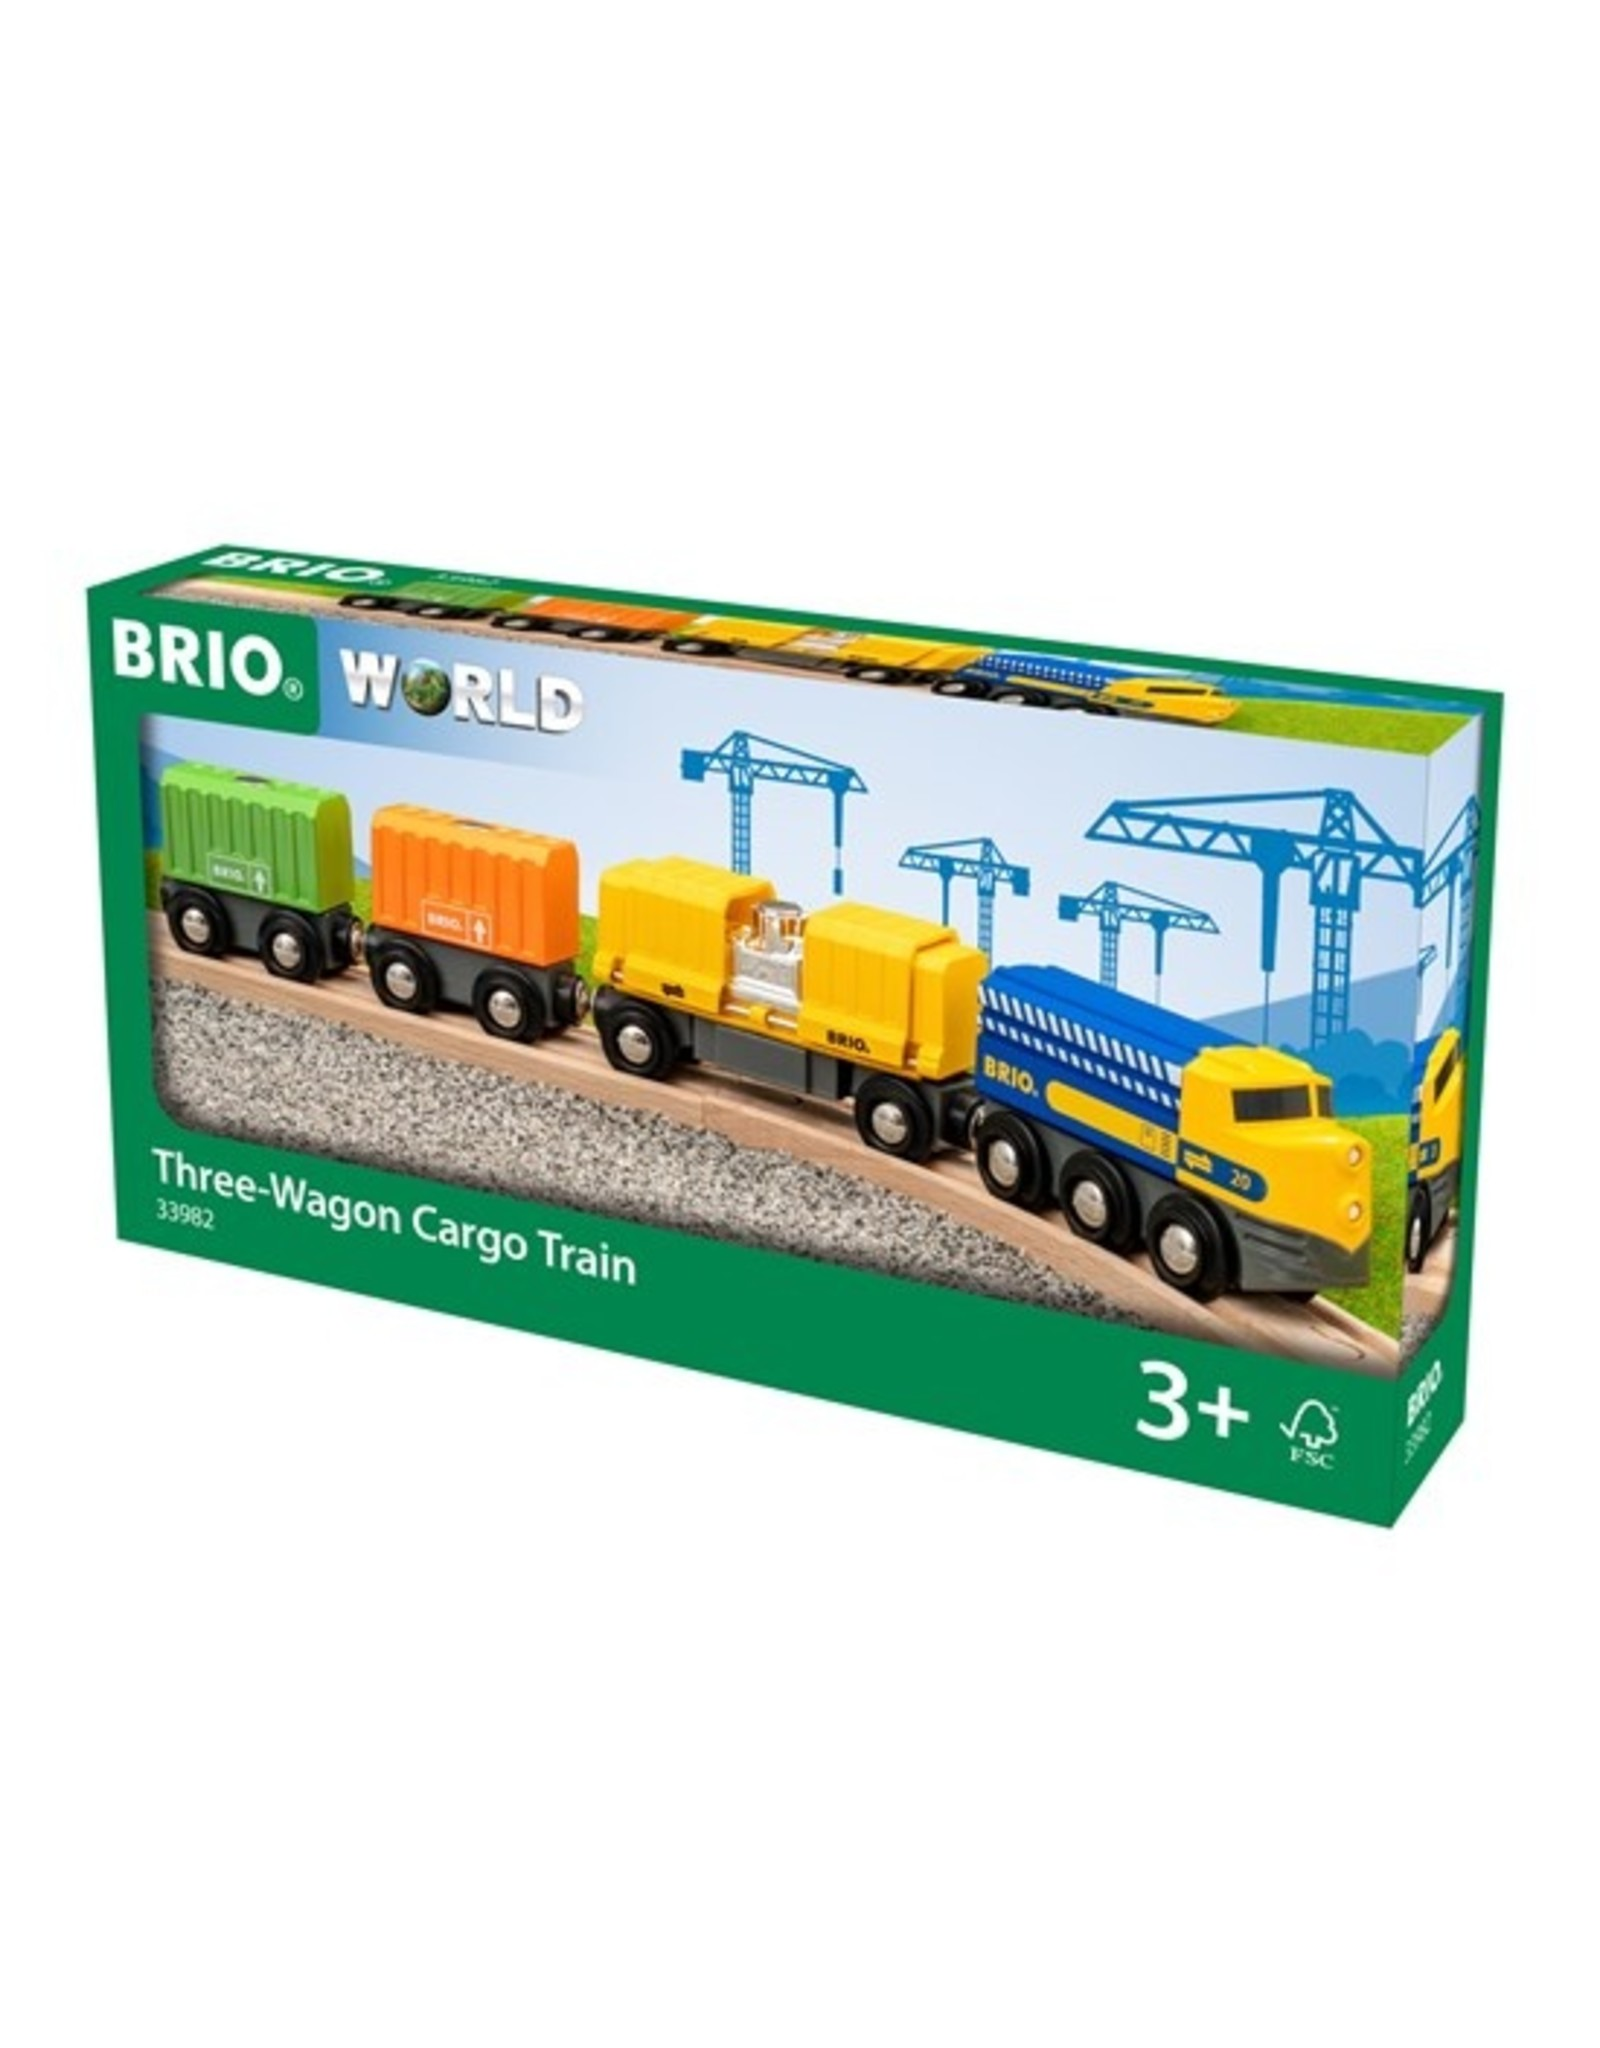 Brio Three Wagon Cargo Train